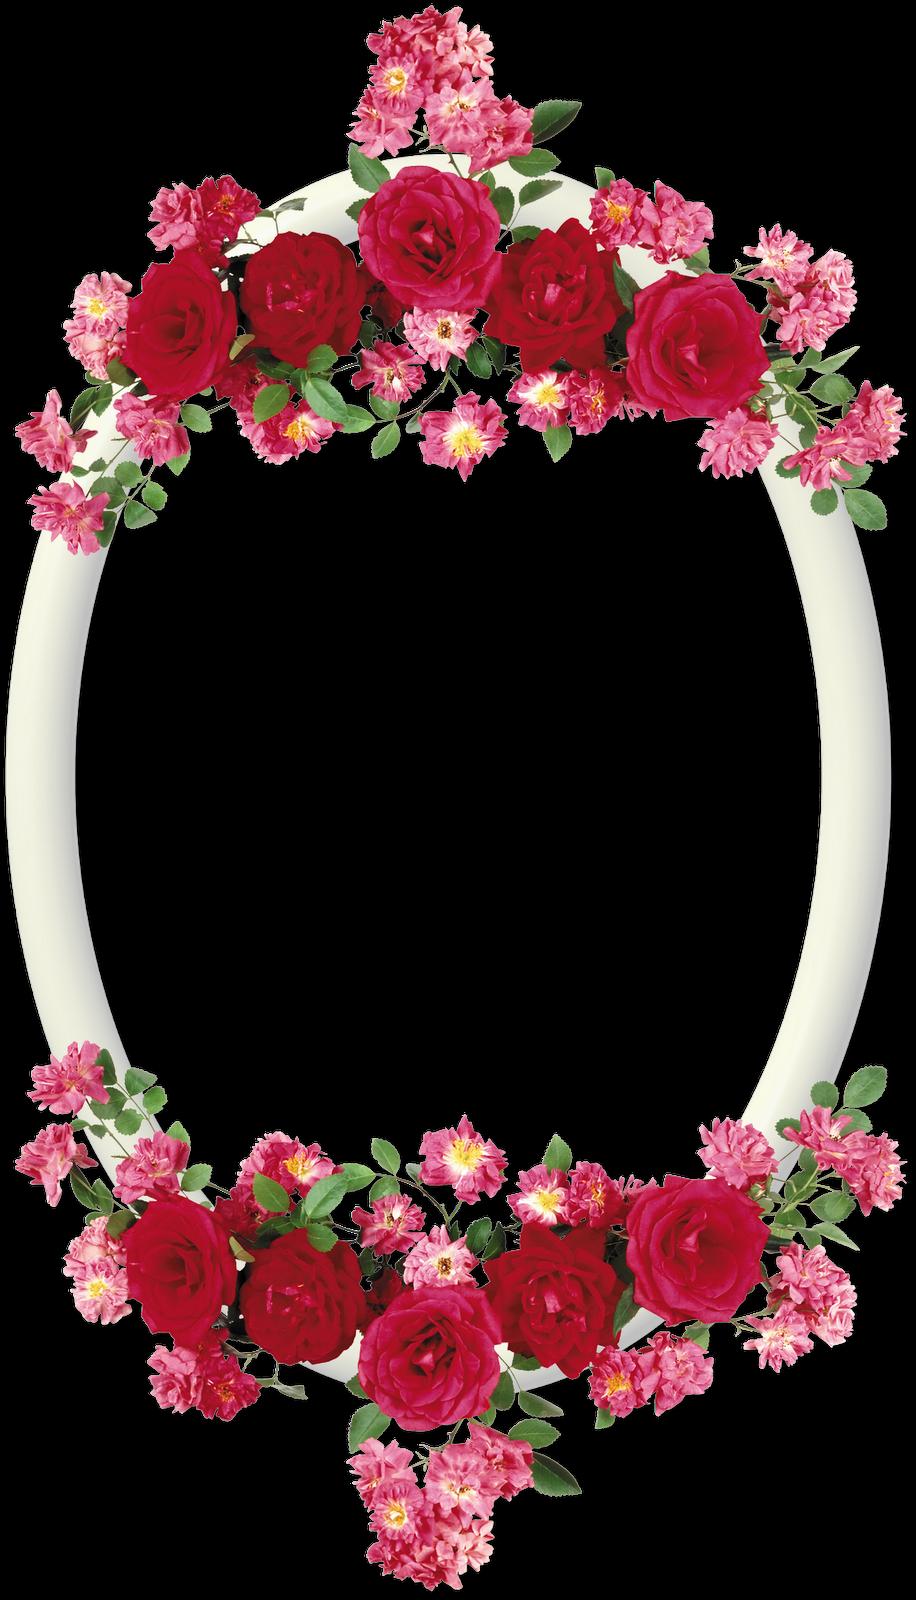 Marcos para fotos: Marcos ovalados con flores | moldes de papel ...